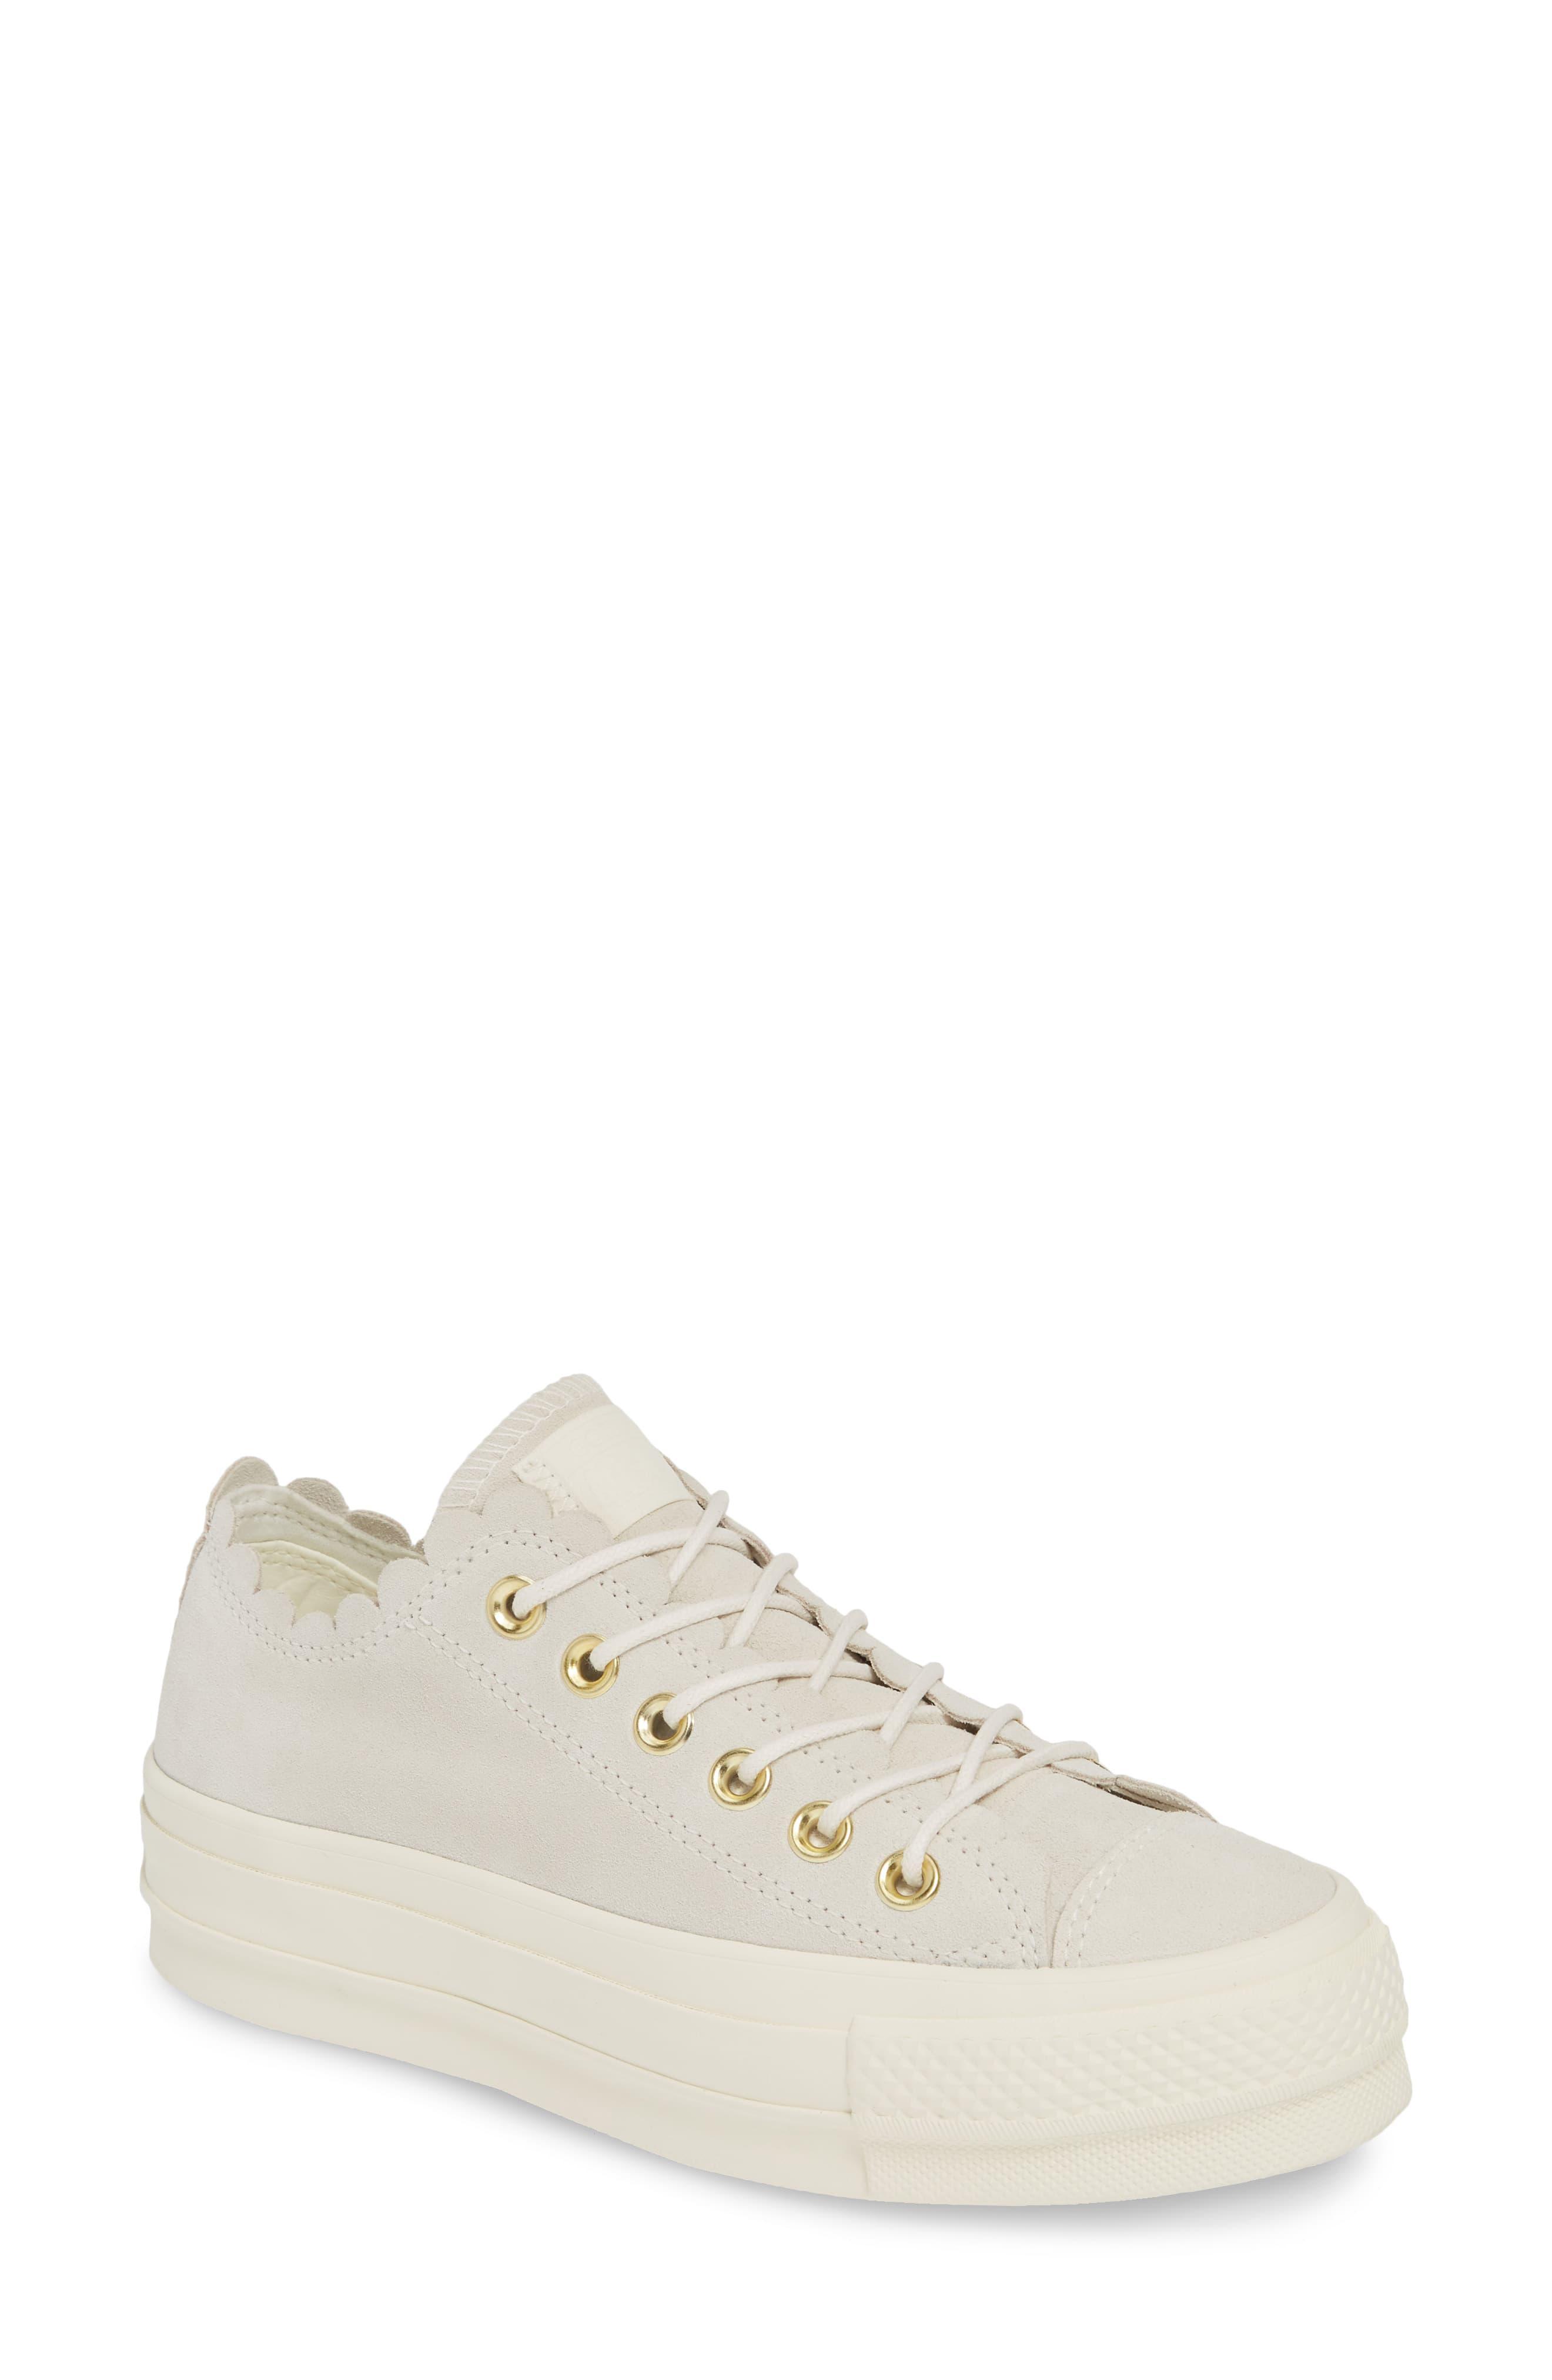 84f050542a Converse. Women s Chuck Taylor All Star Frilly Scallop Platform Sneaker